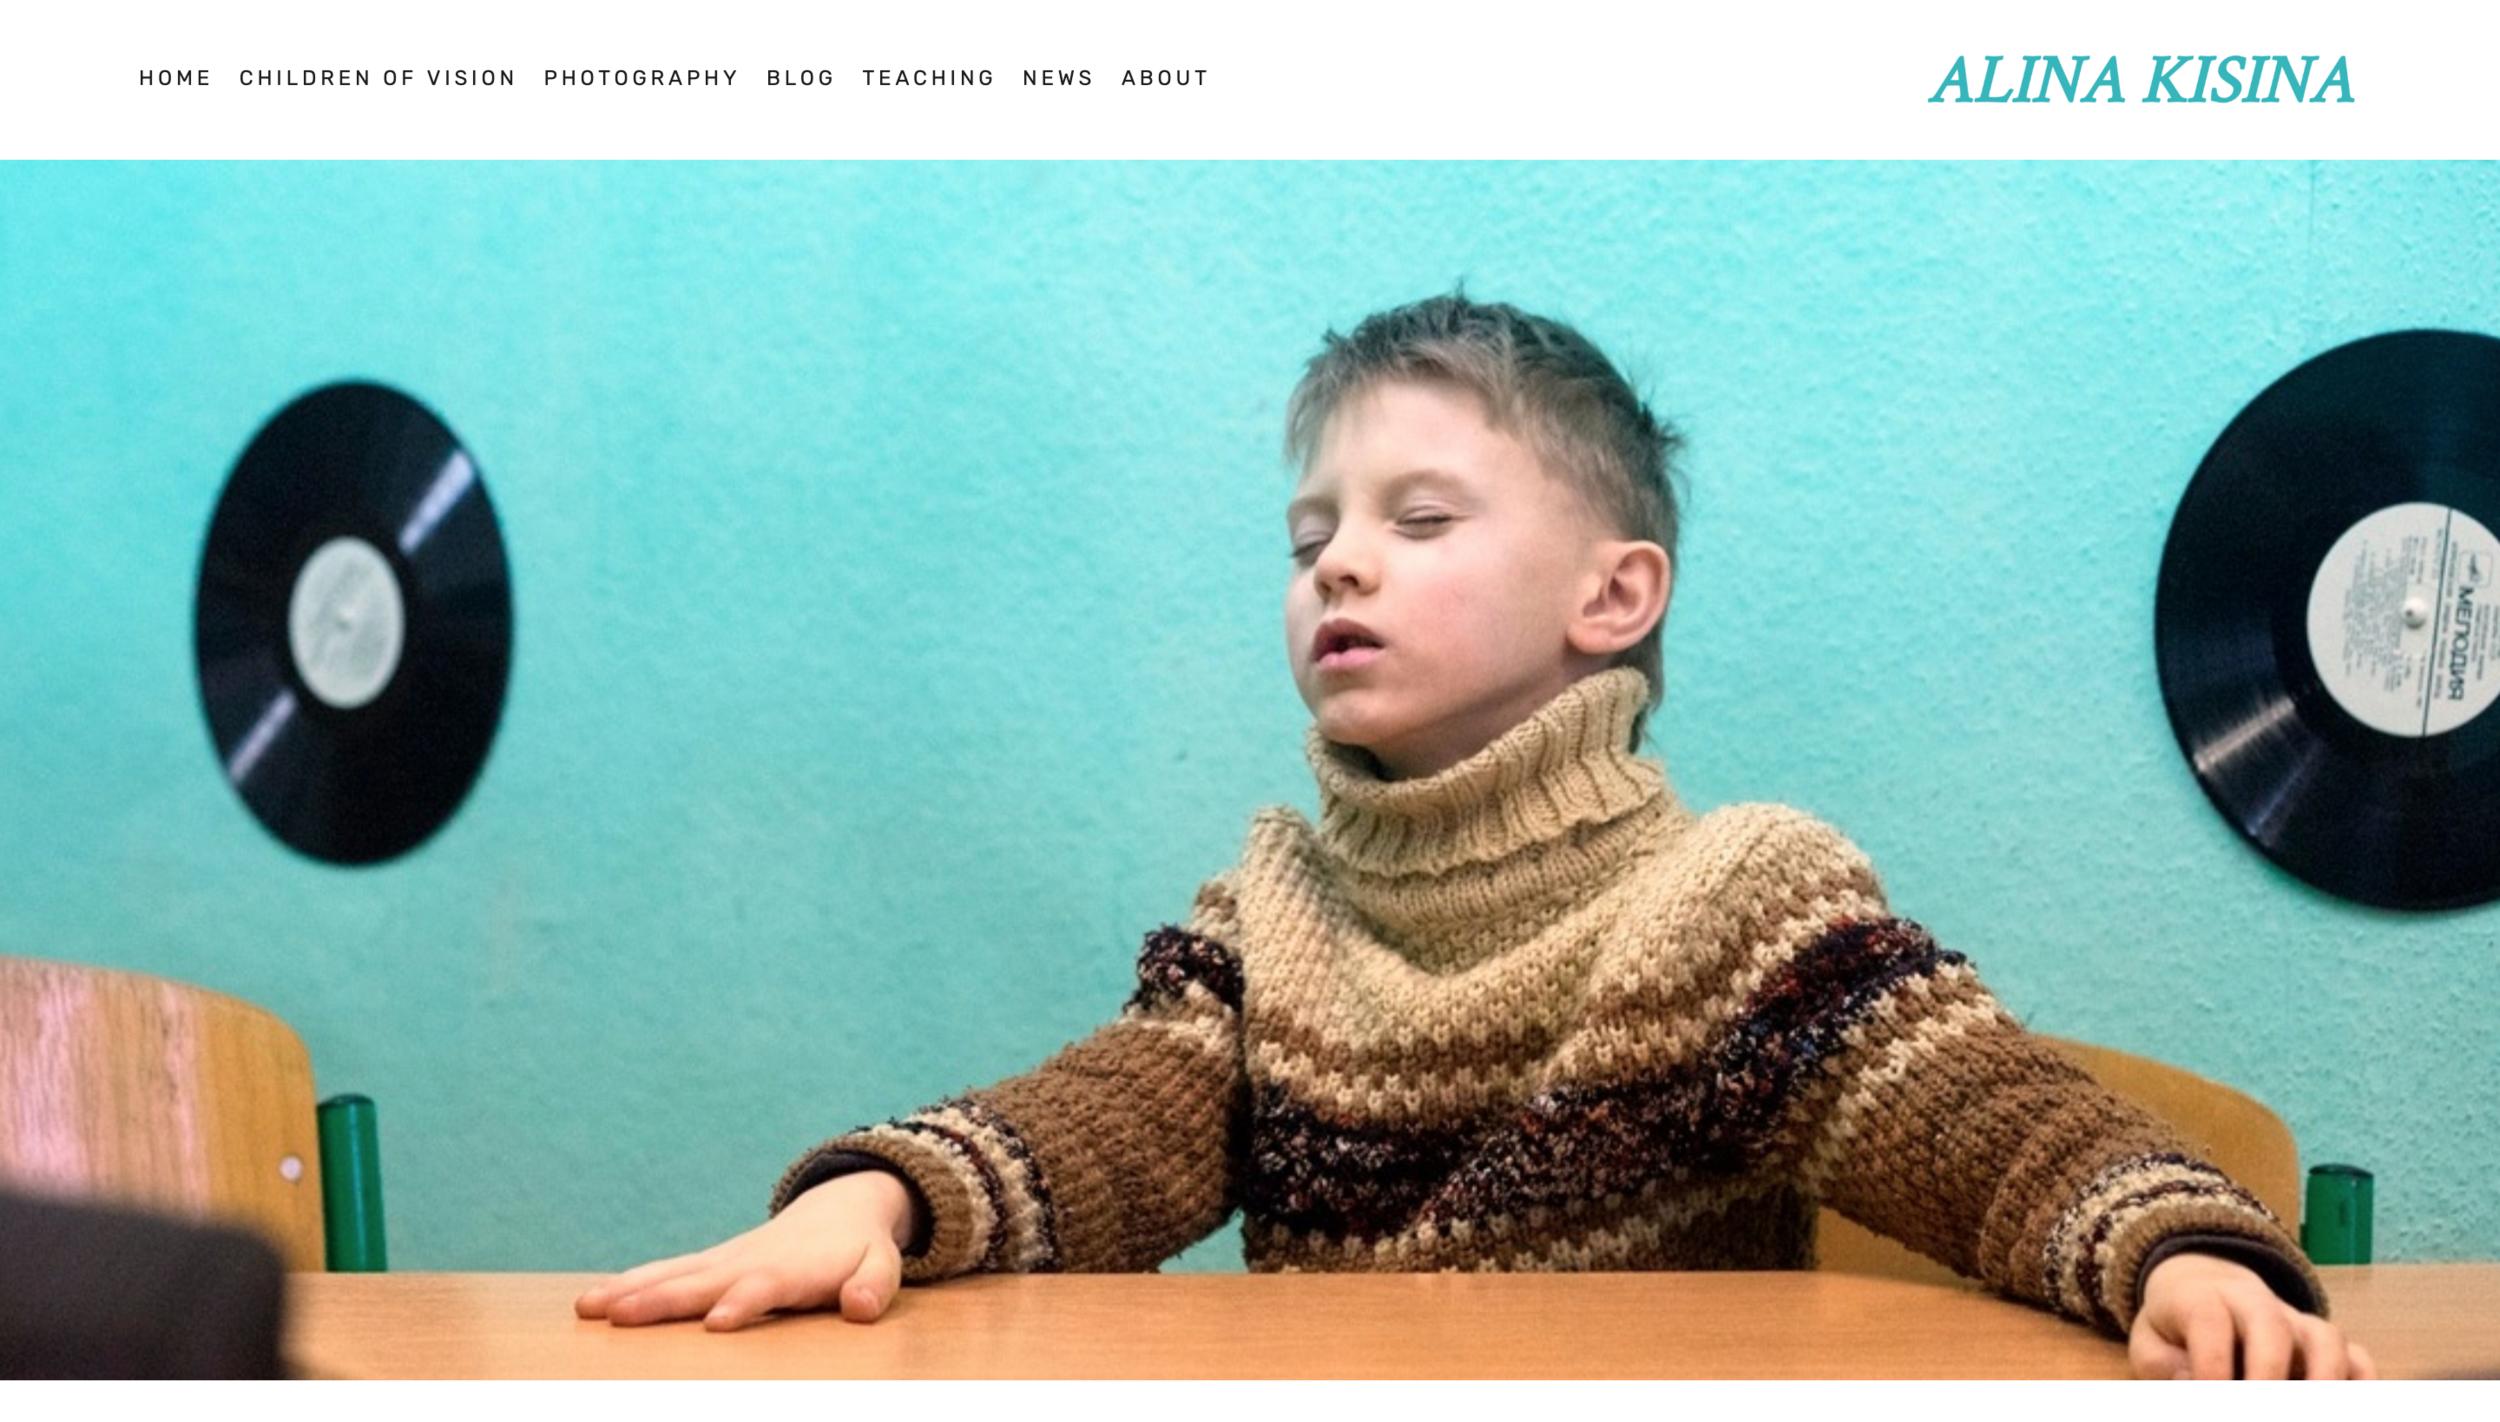 Rosehip Website Design - Portfolio - Alina Kisina